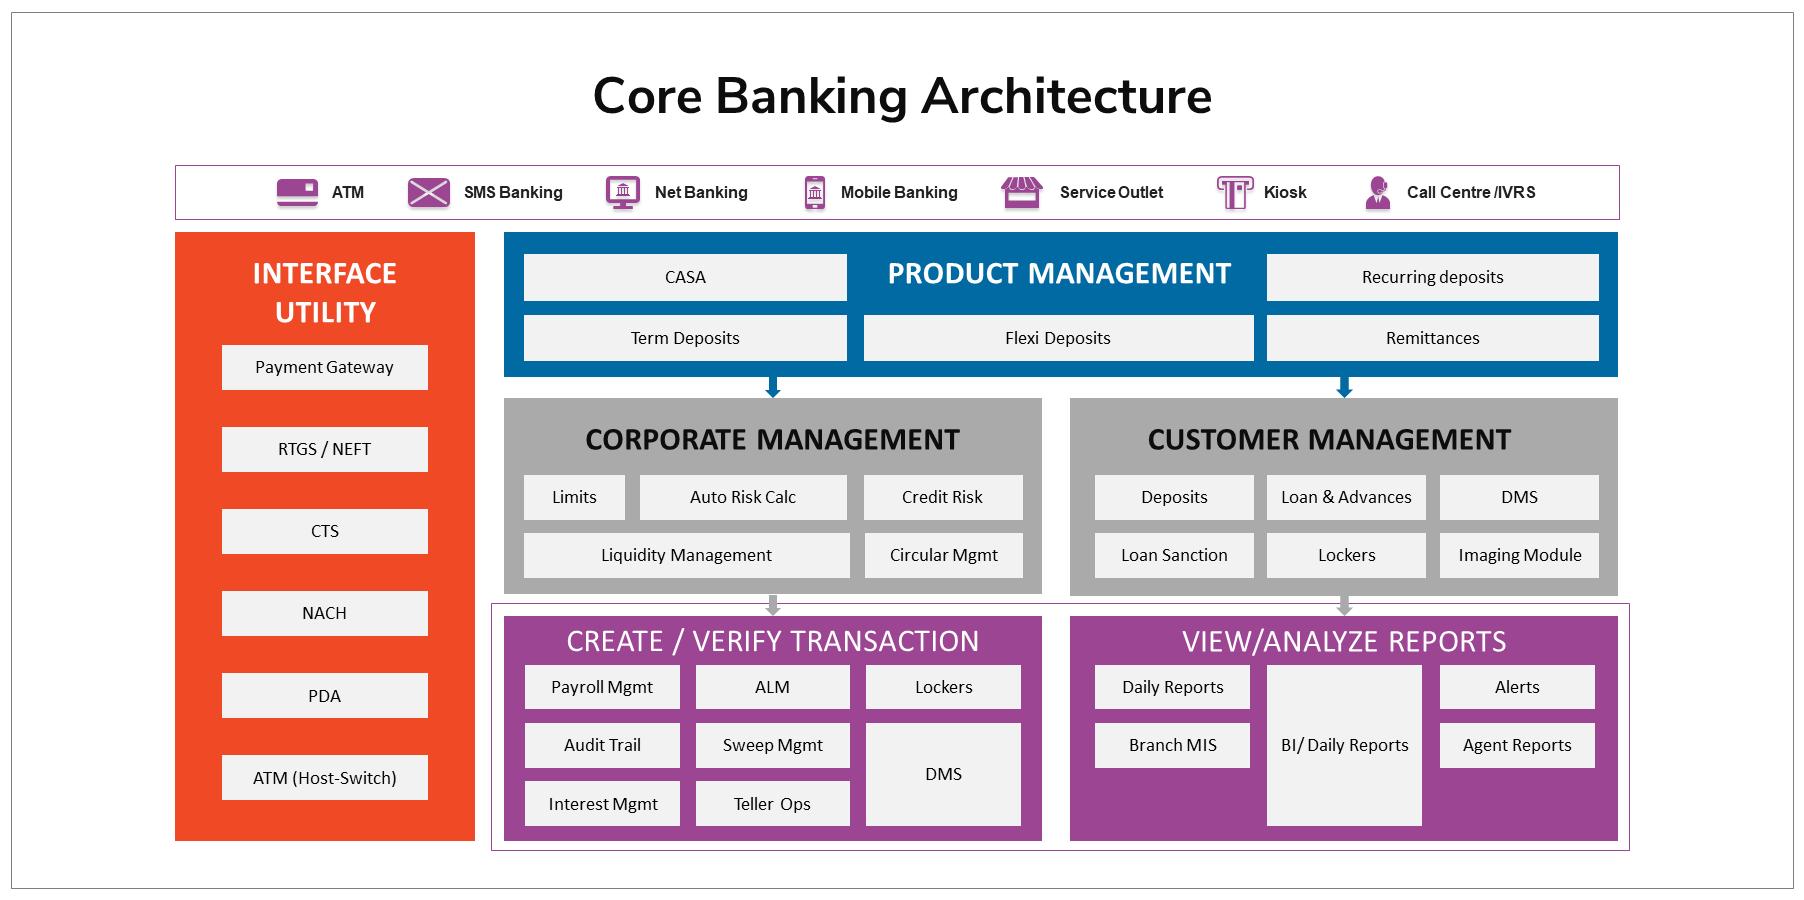 Core Banking Architecture